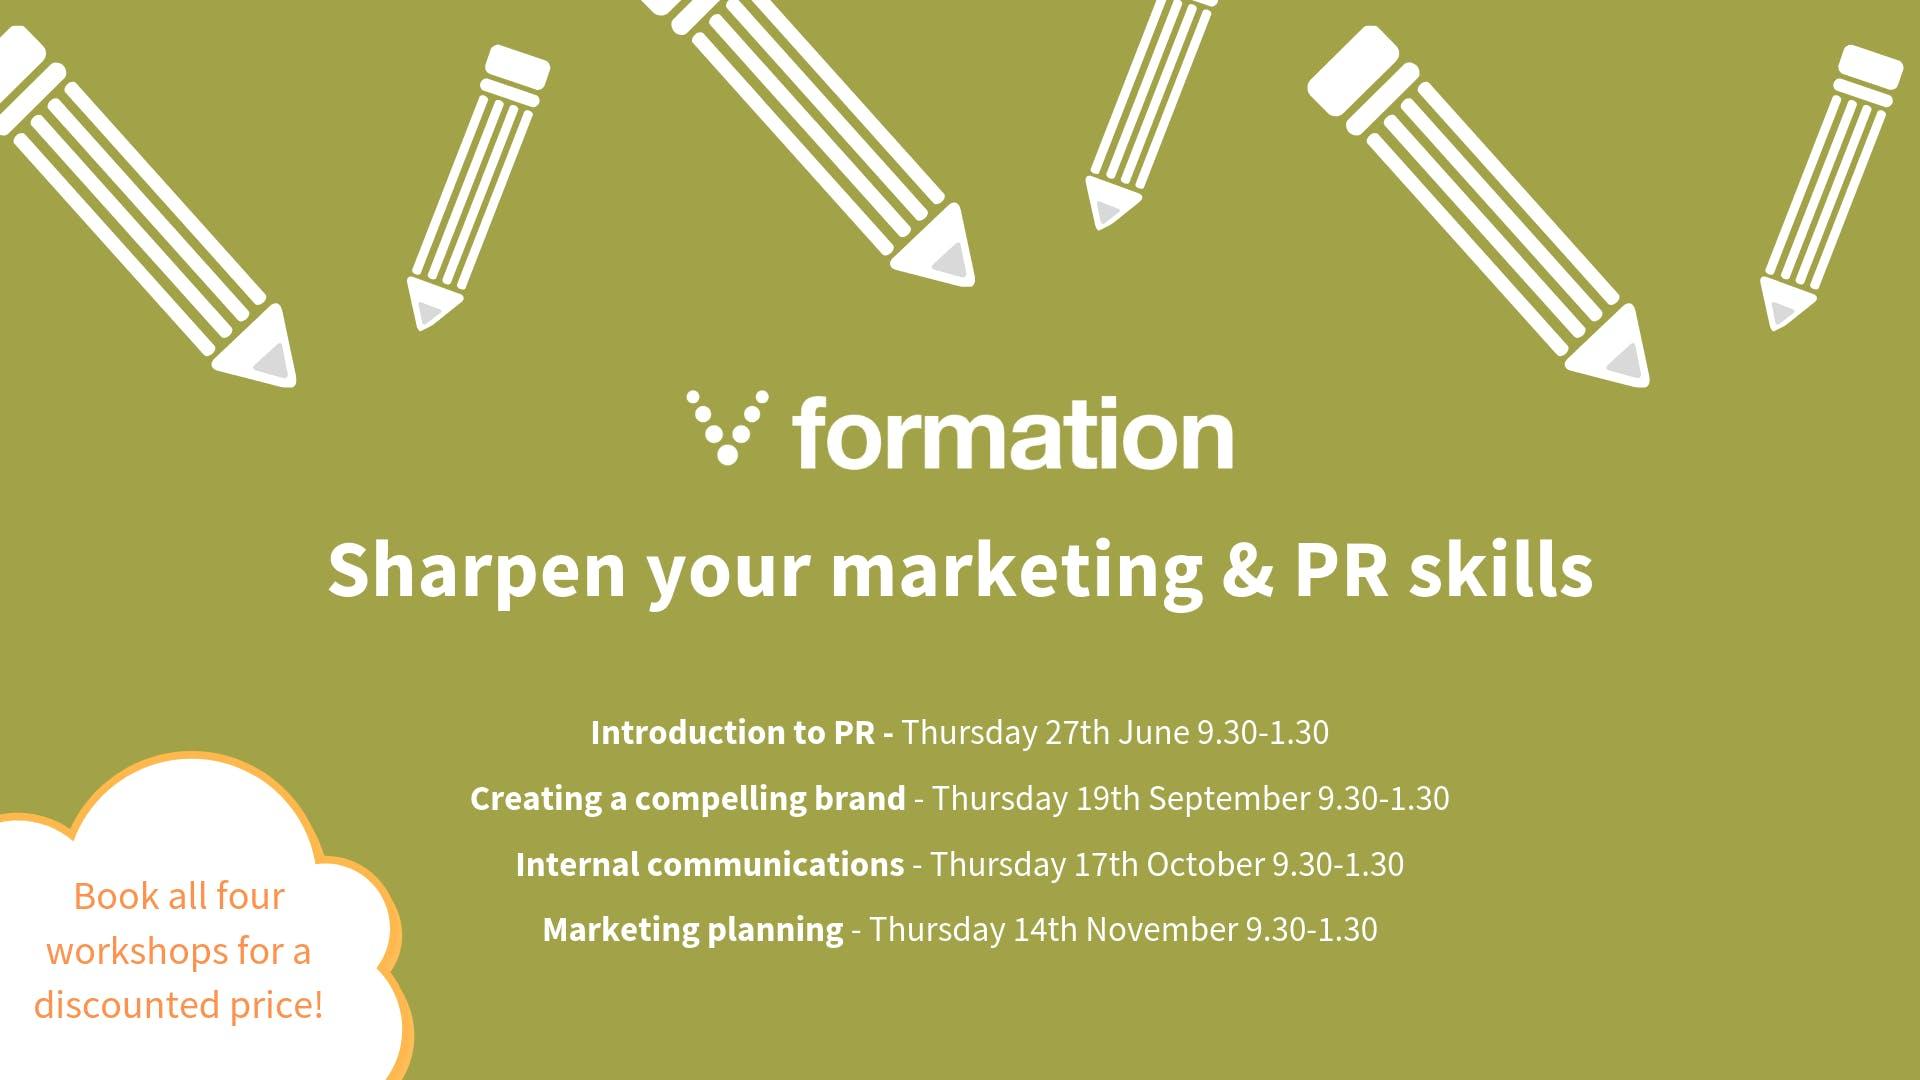 Sharpen your marketing & PR skills workshops